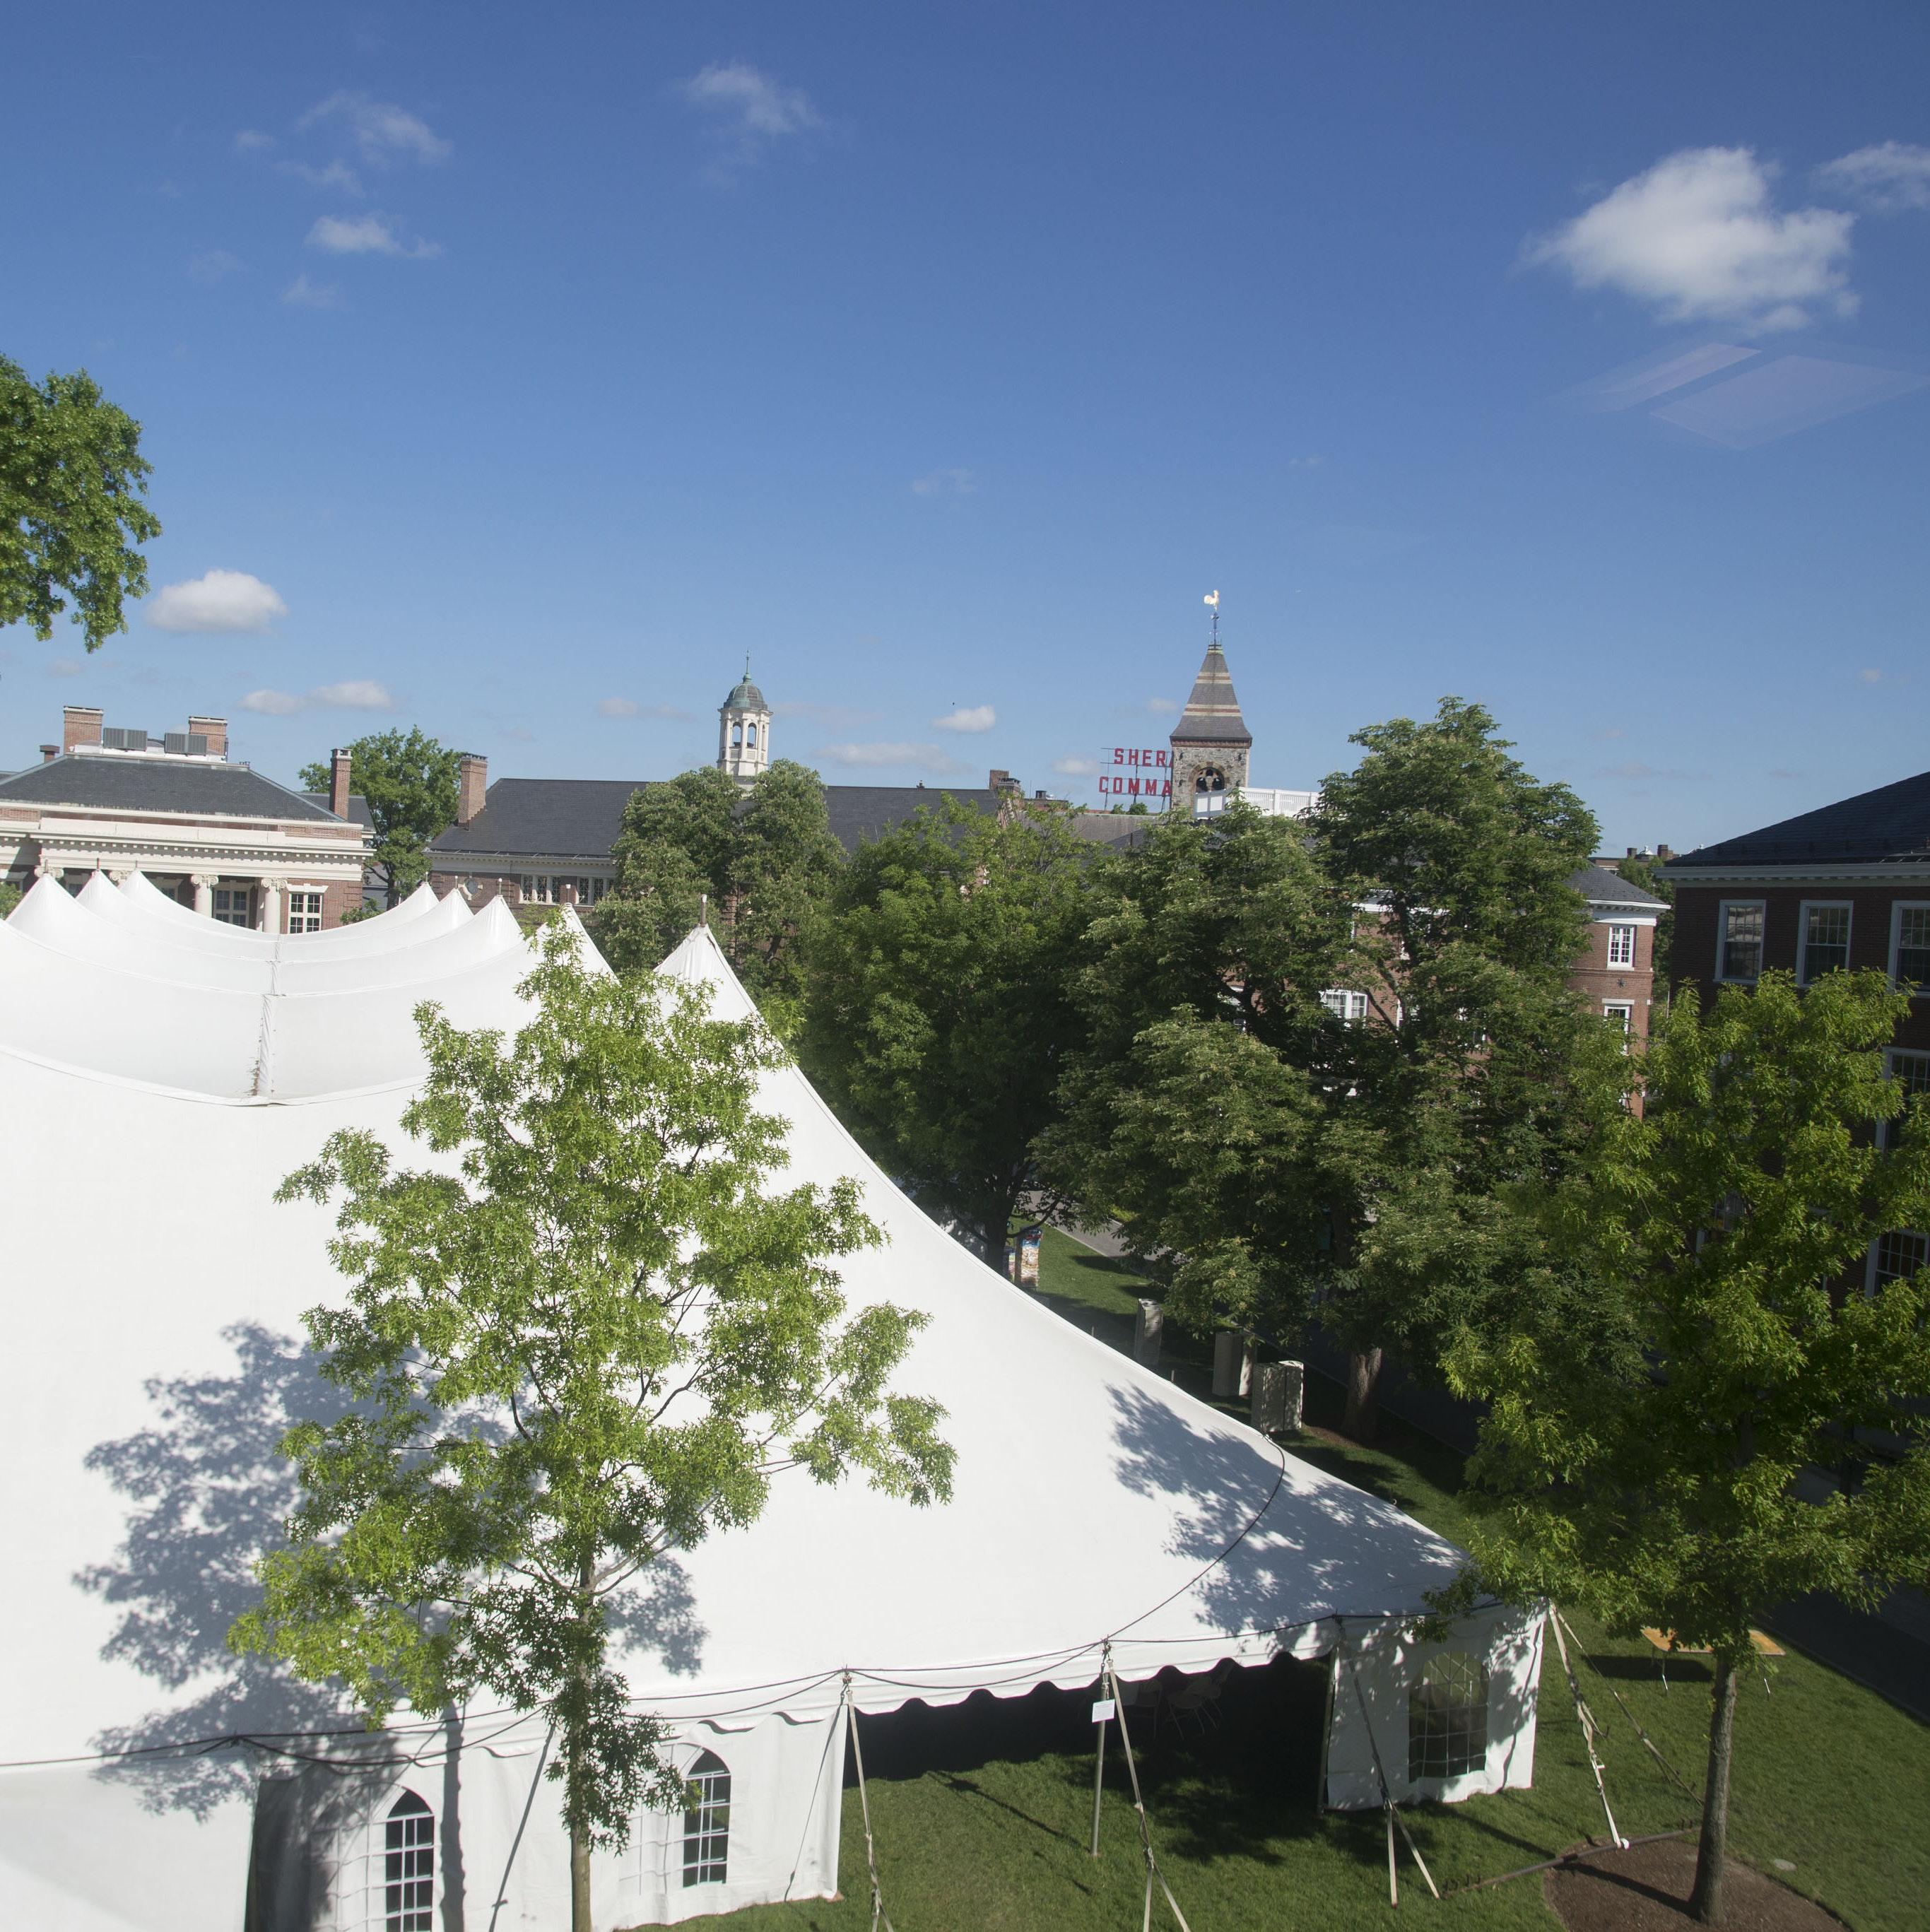 Dsc7411 Radcliffe Day Tent Tr